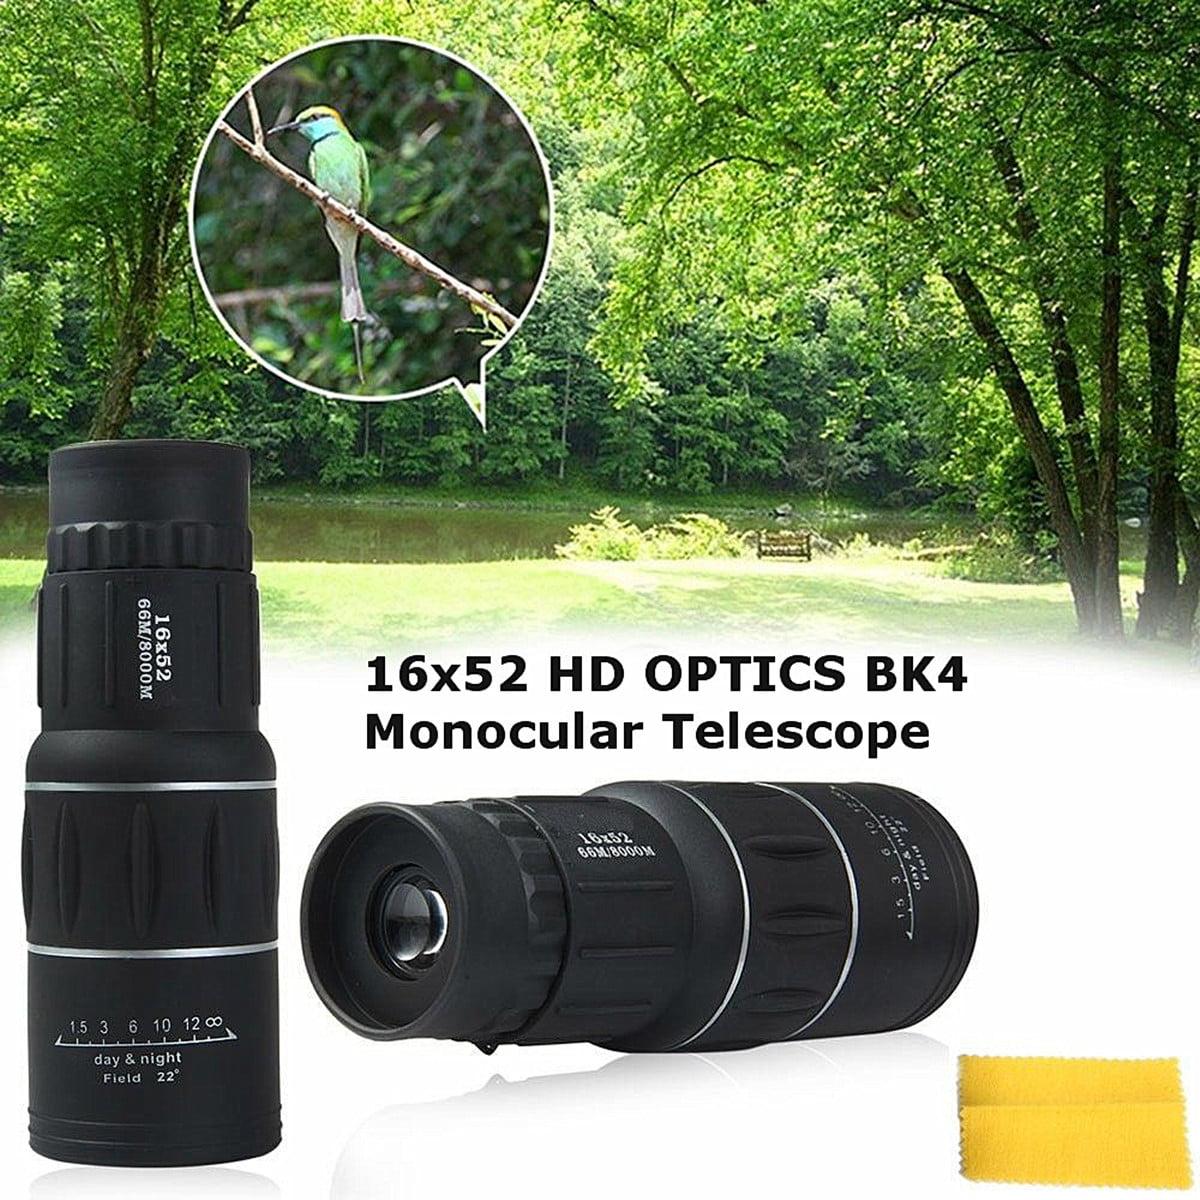 16X52 Focus Zoom Portable Travelling HD OPTICS BAK4 Monocular Telescope